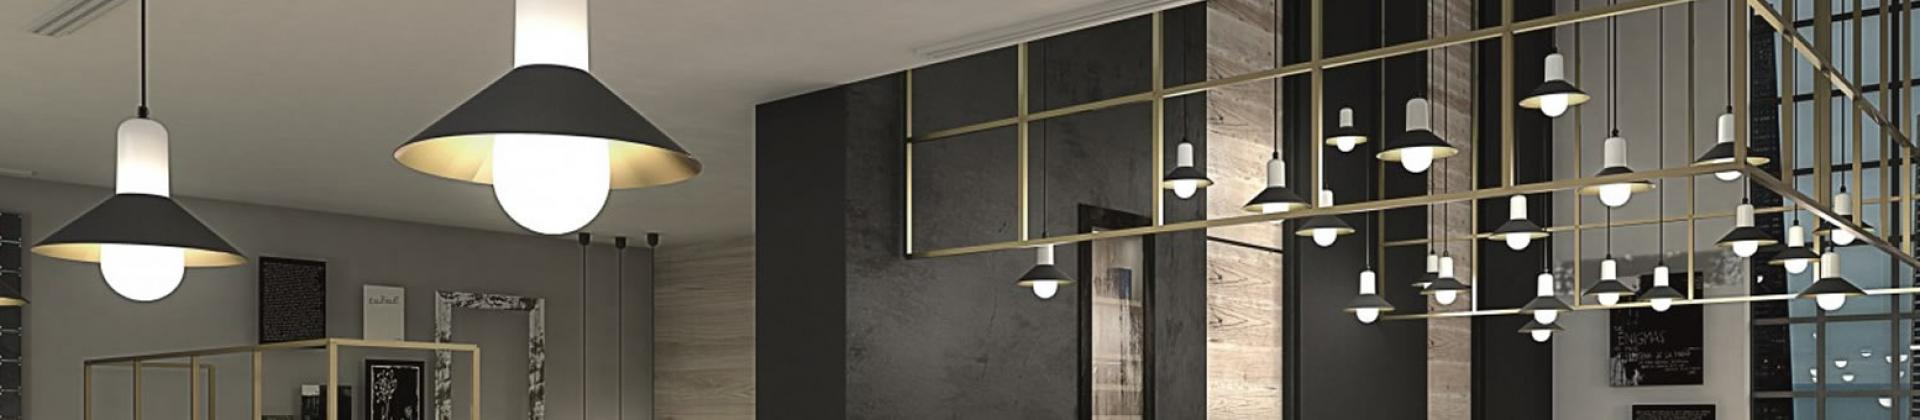 Milan Iluminacion - Lámparas de diseño